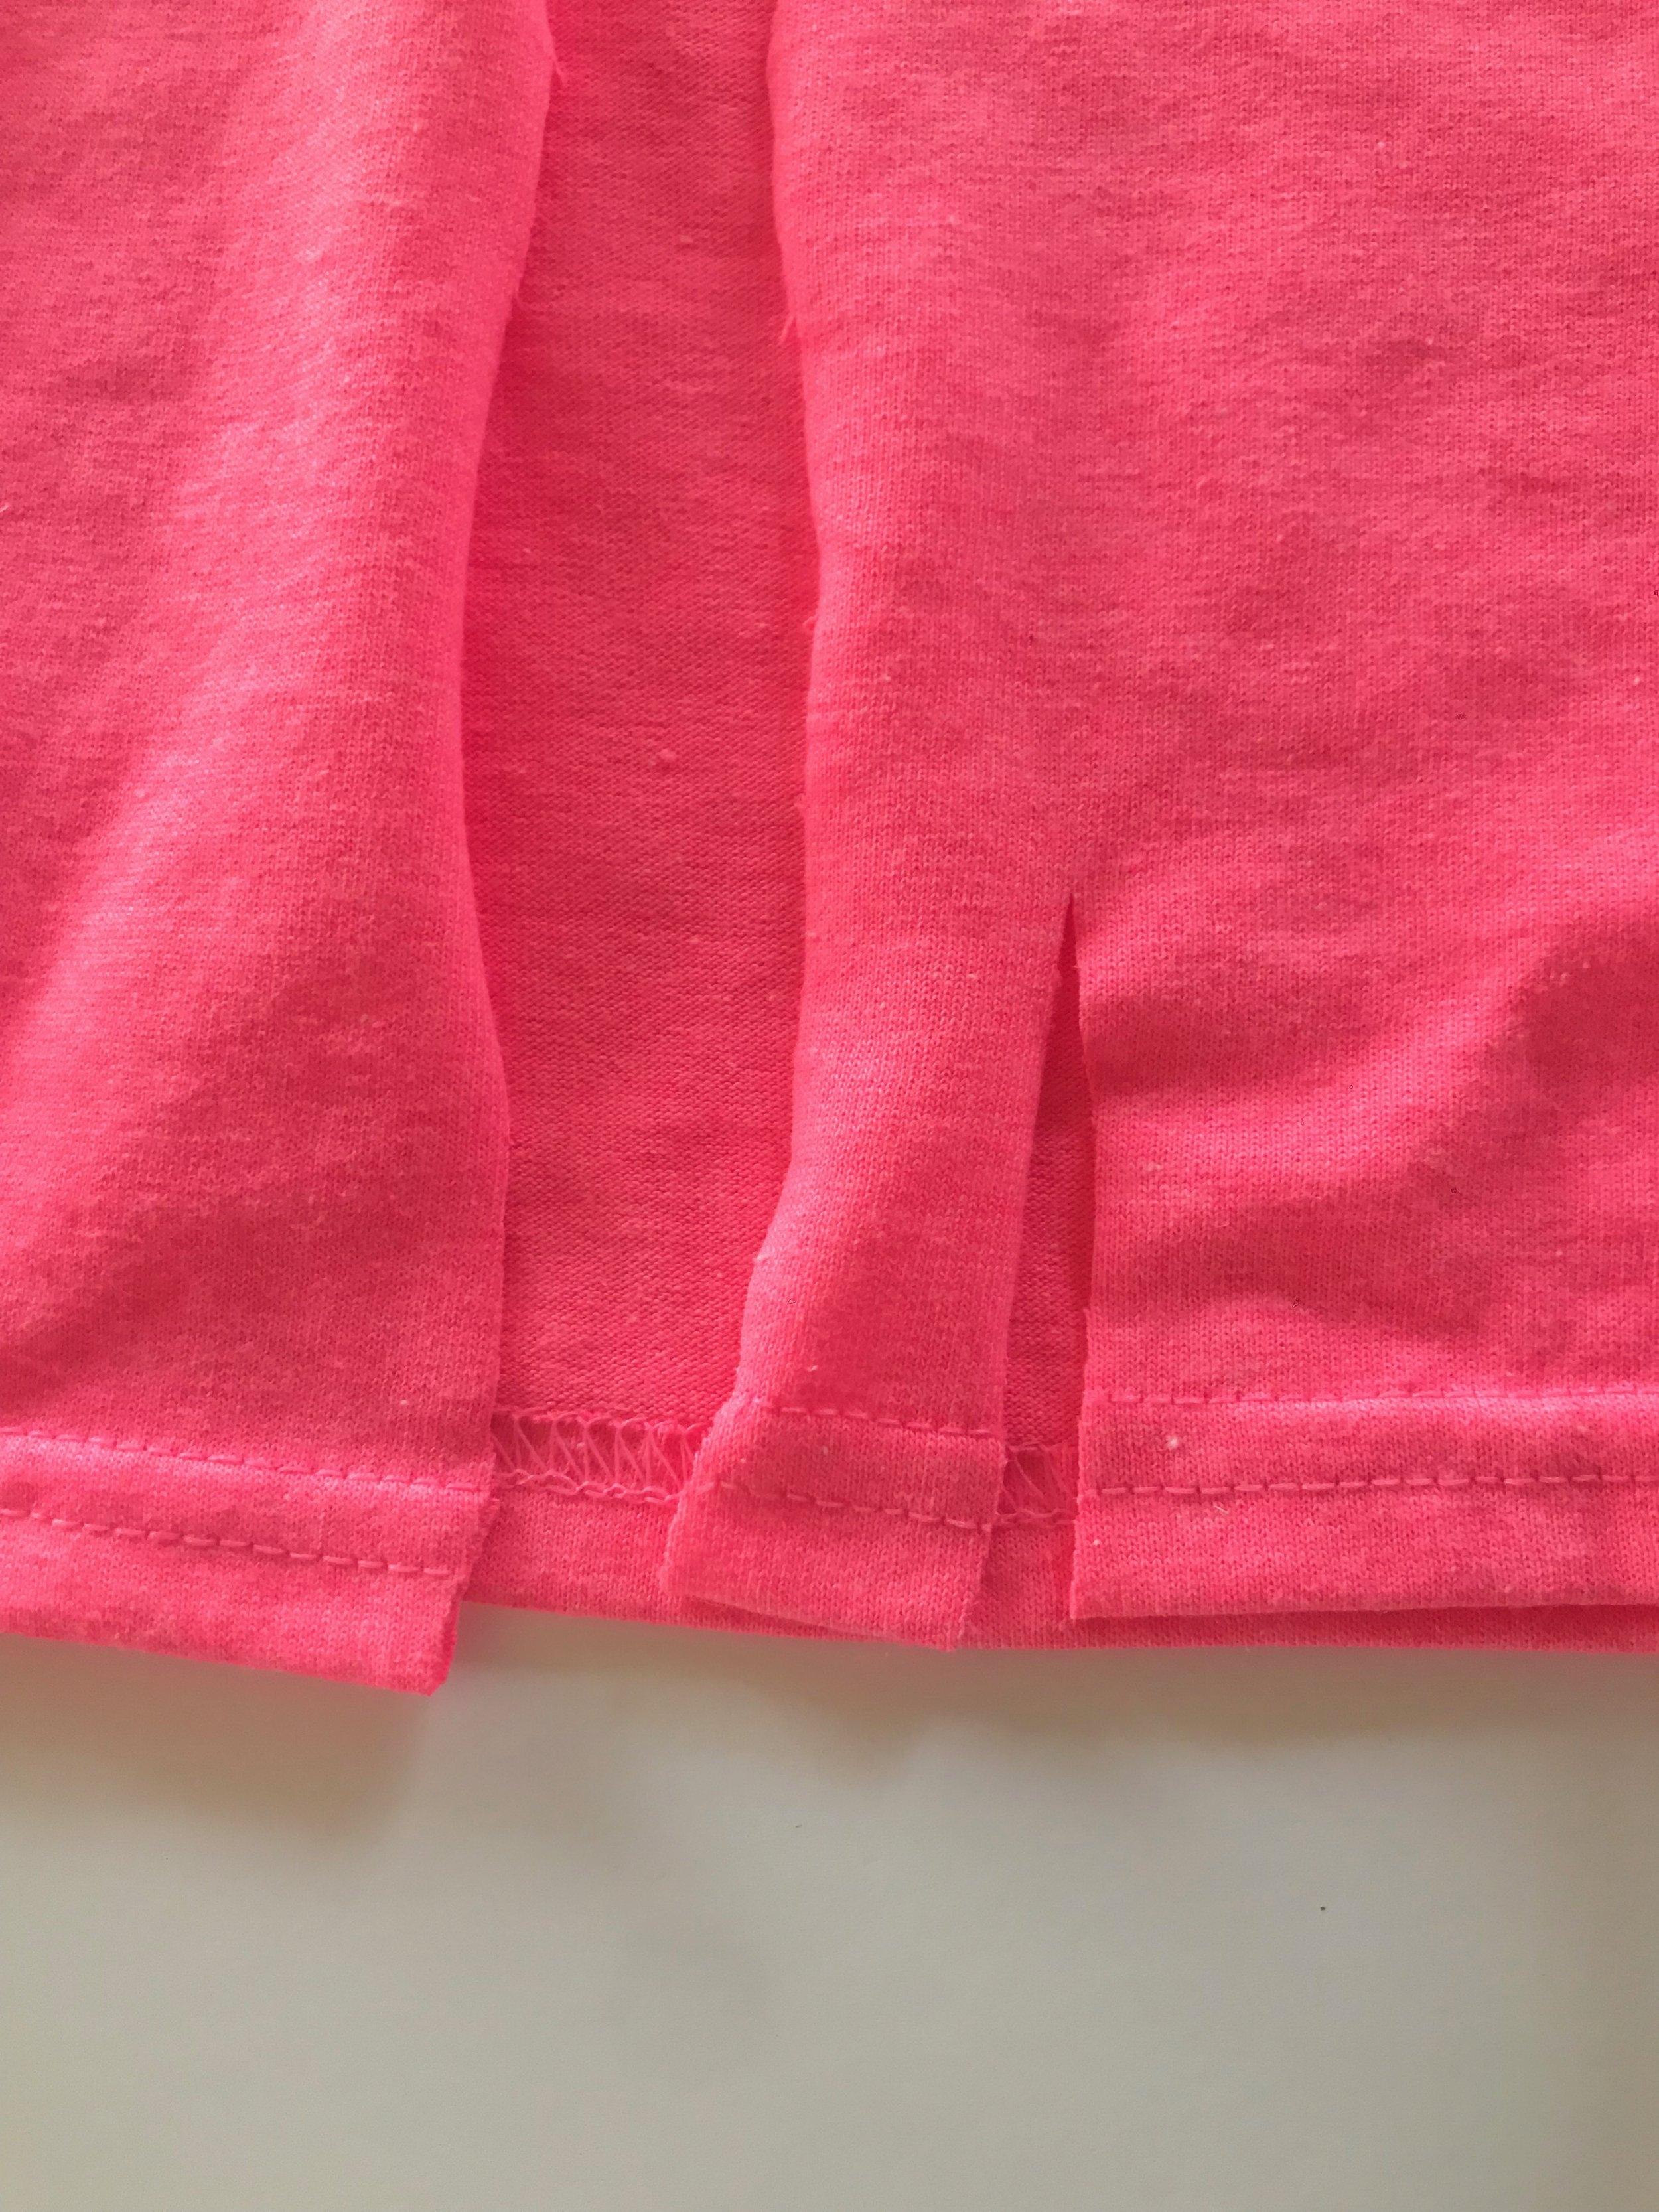 Easy T Shirt Bib Apron or Smock   Peonies and Cream